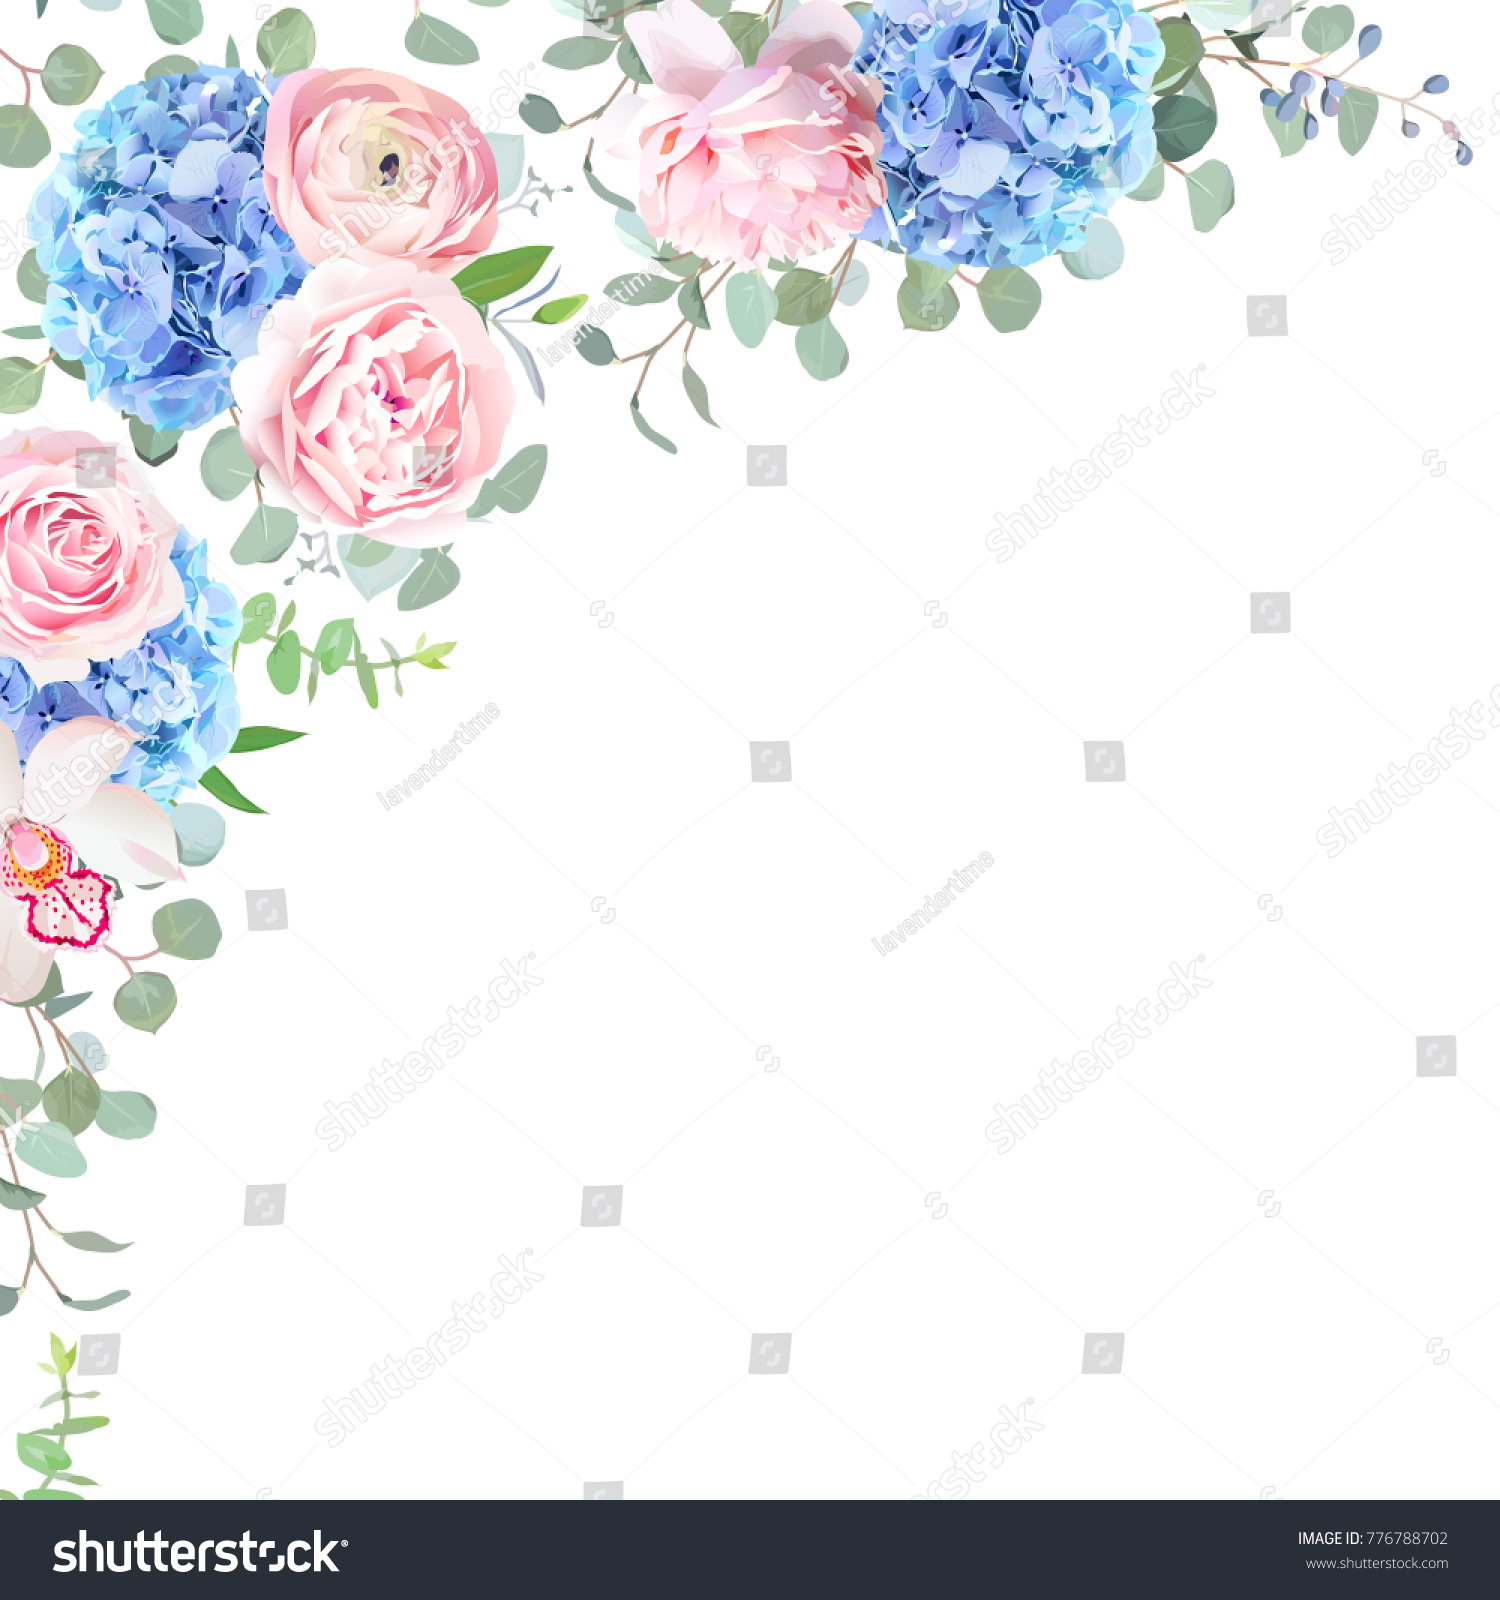 Blue Hydrangea Orchid Pink Rose Ranunculus Eucalyptus And